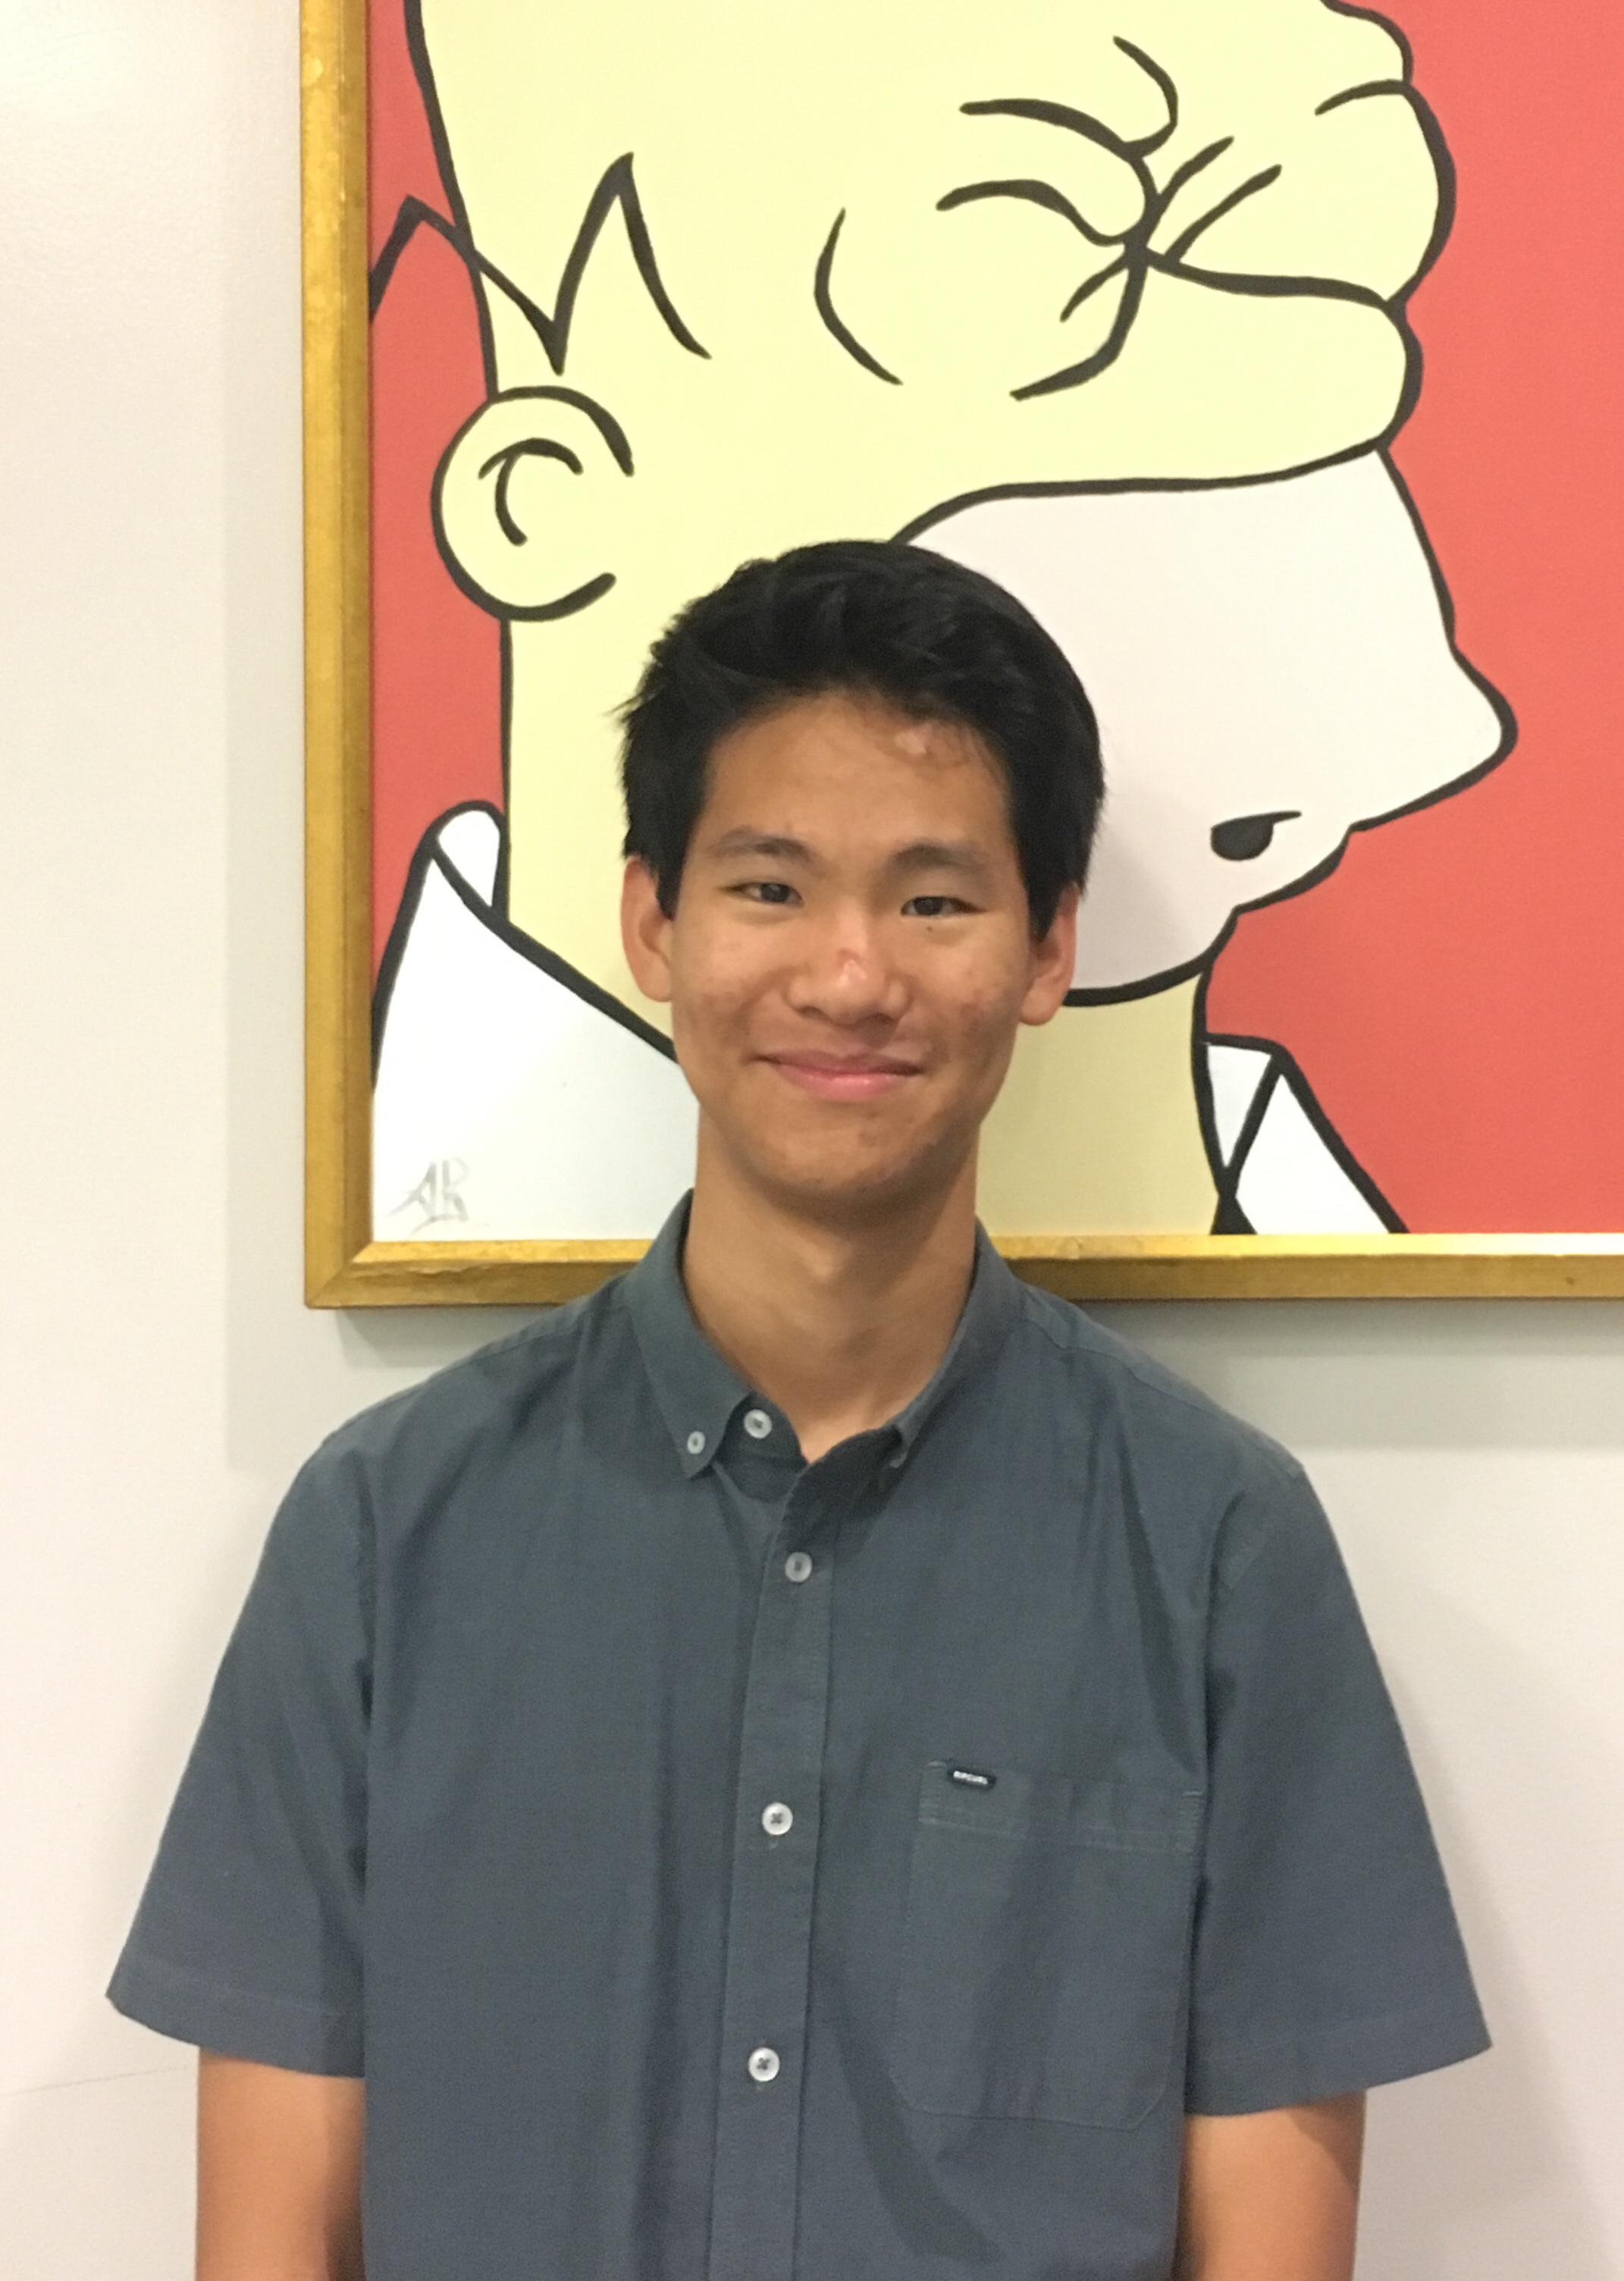 Jun Lee, Endevvr Class of 2018